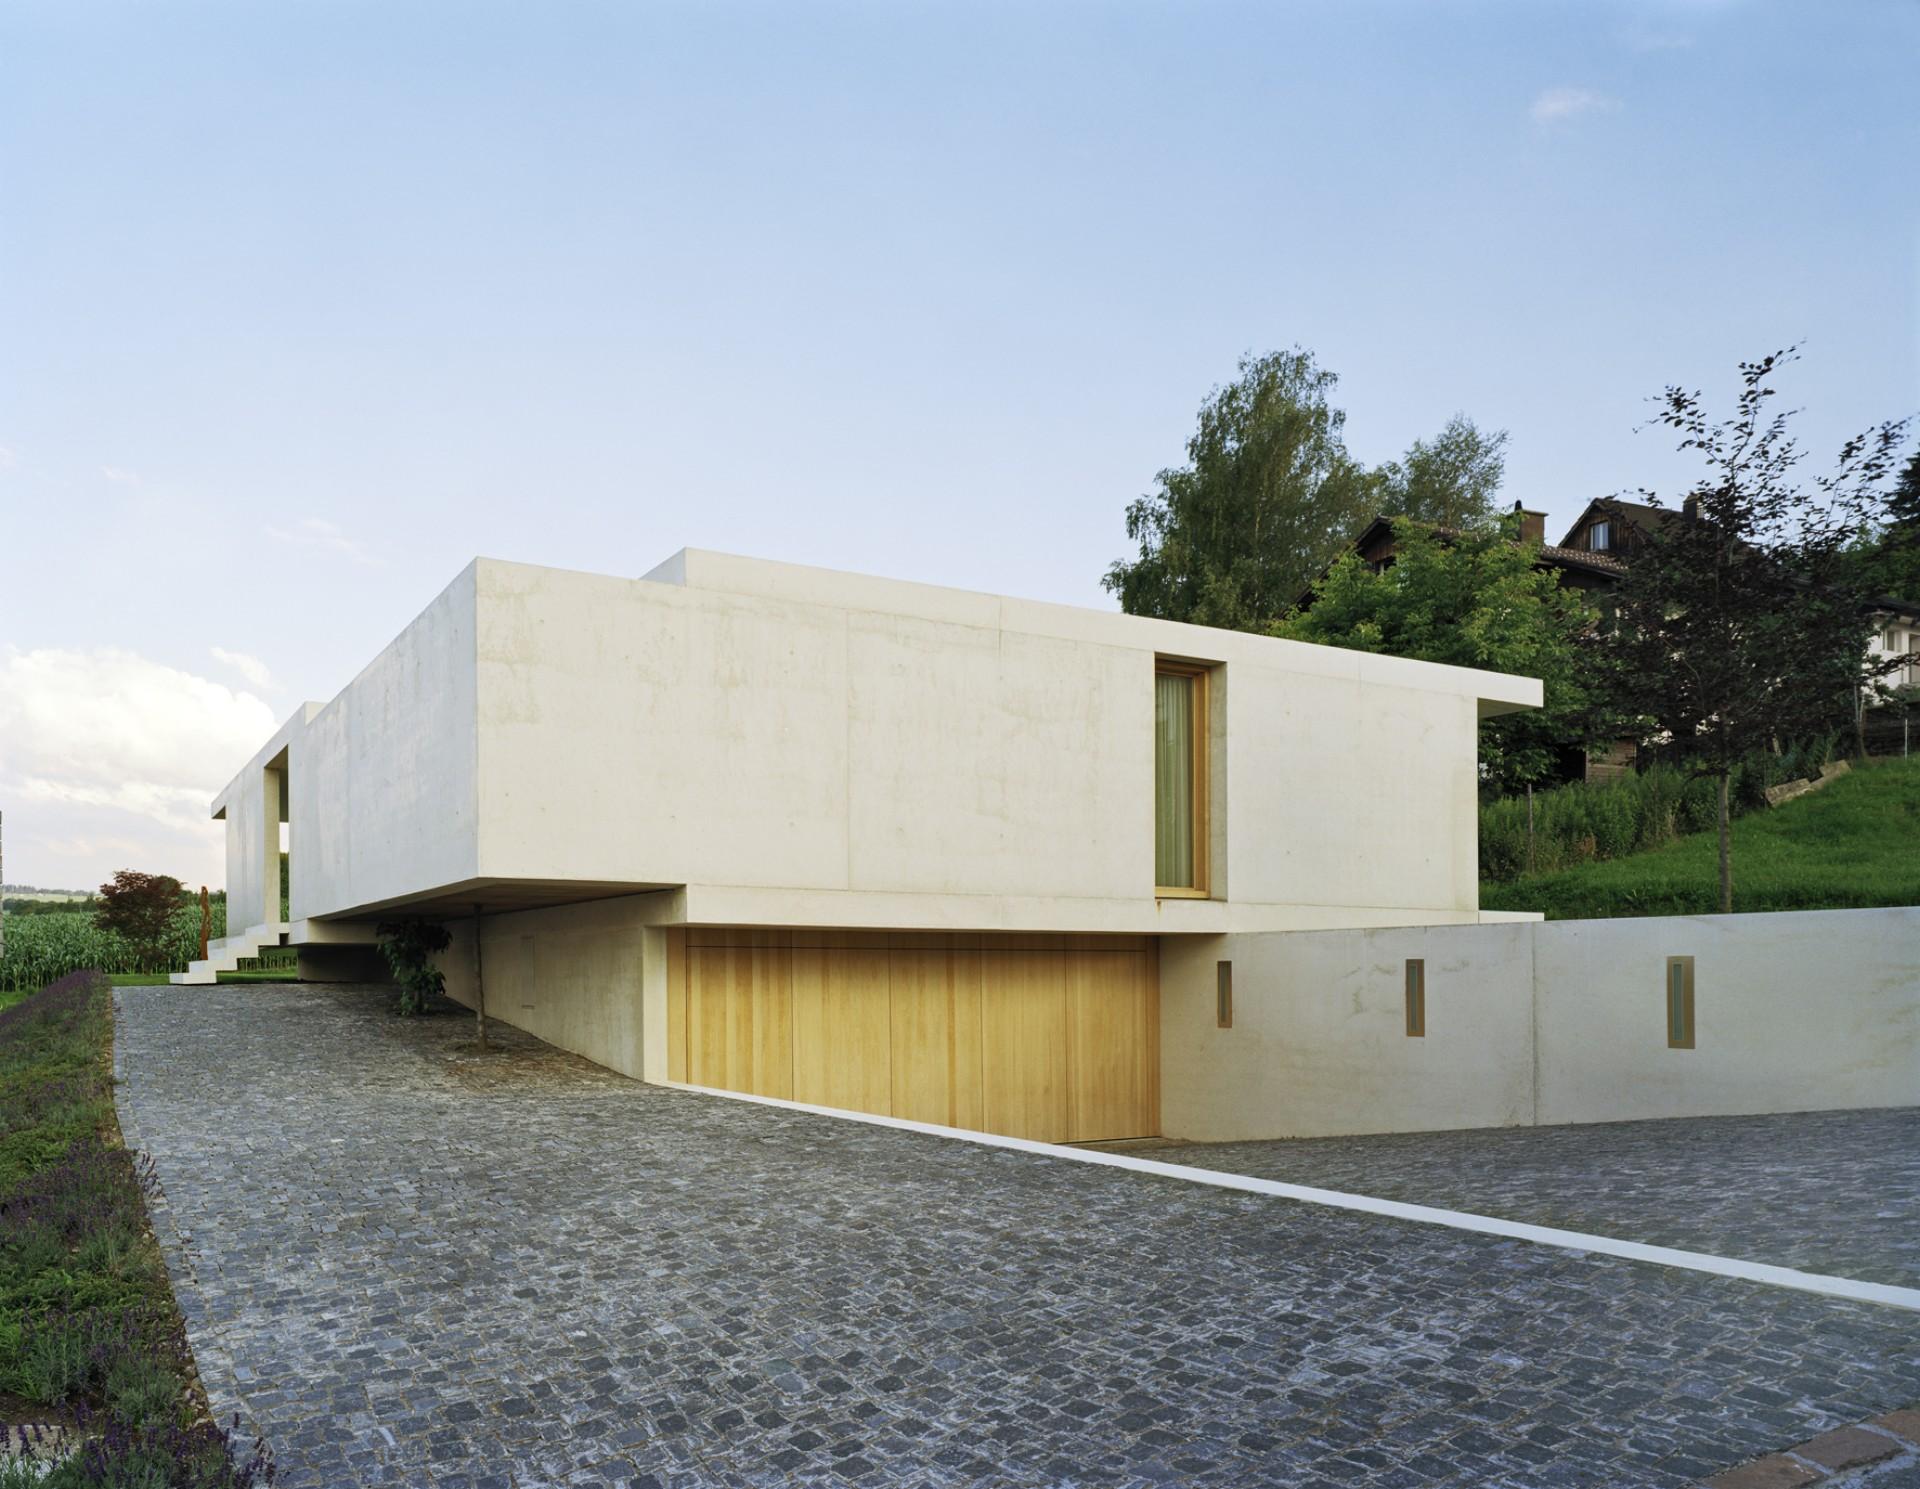 Exposición Rossetti + Wyss Architekten - fingerprints París